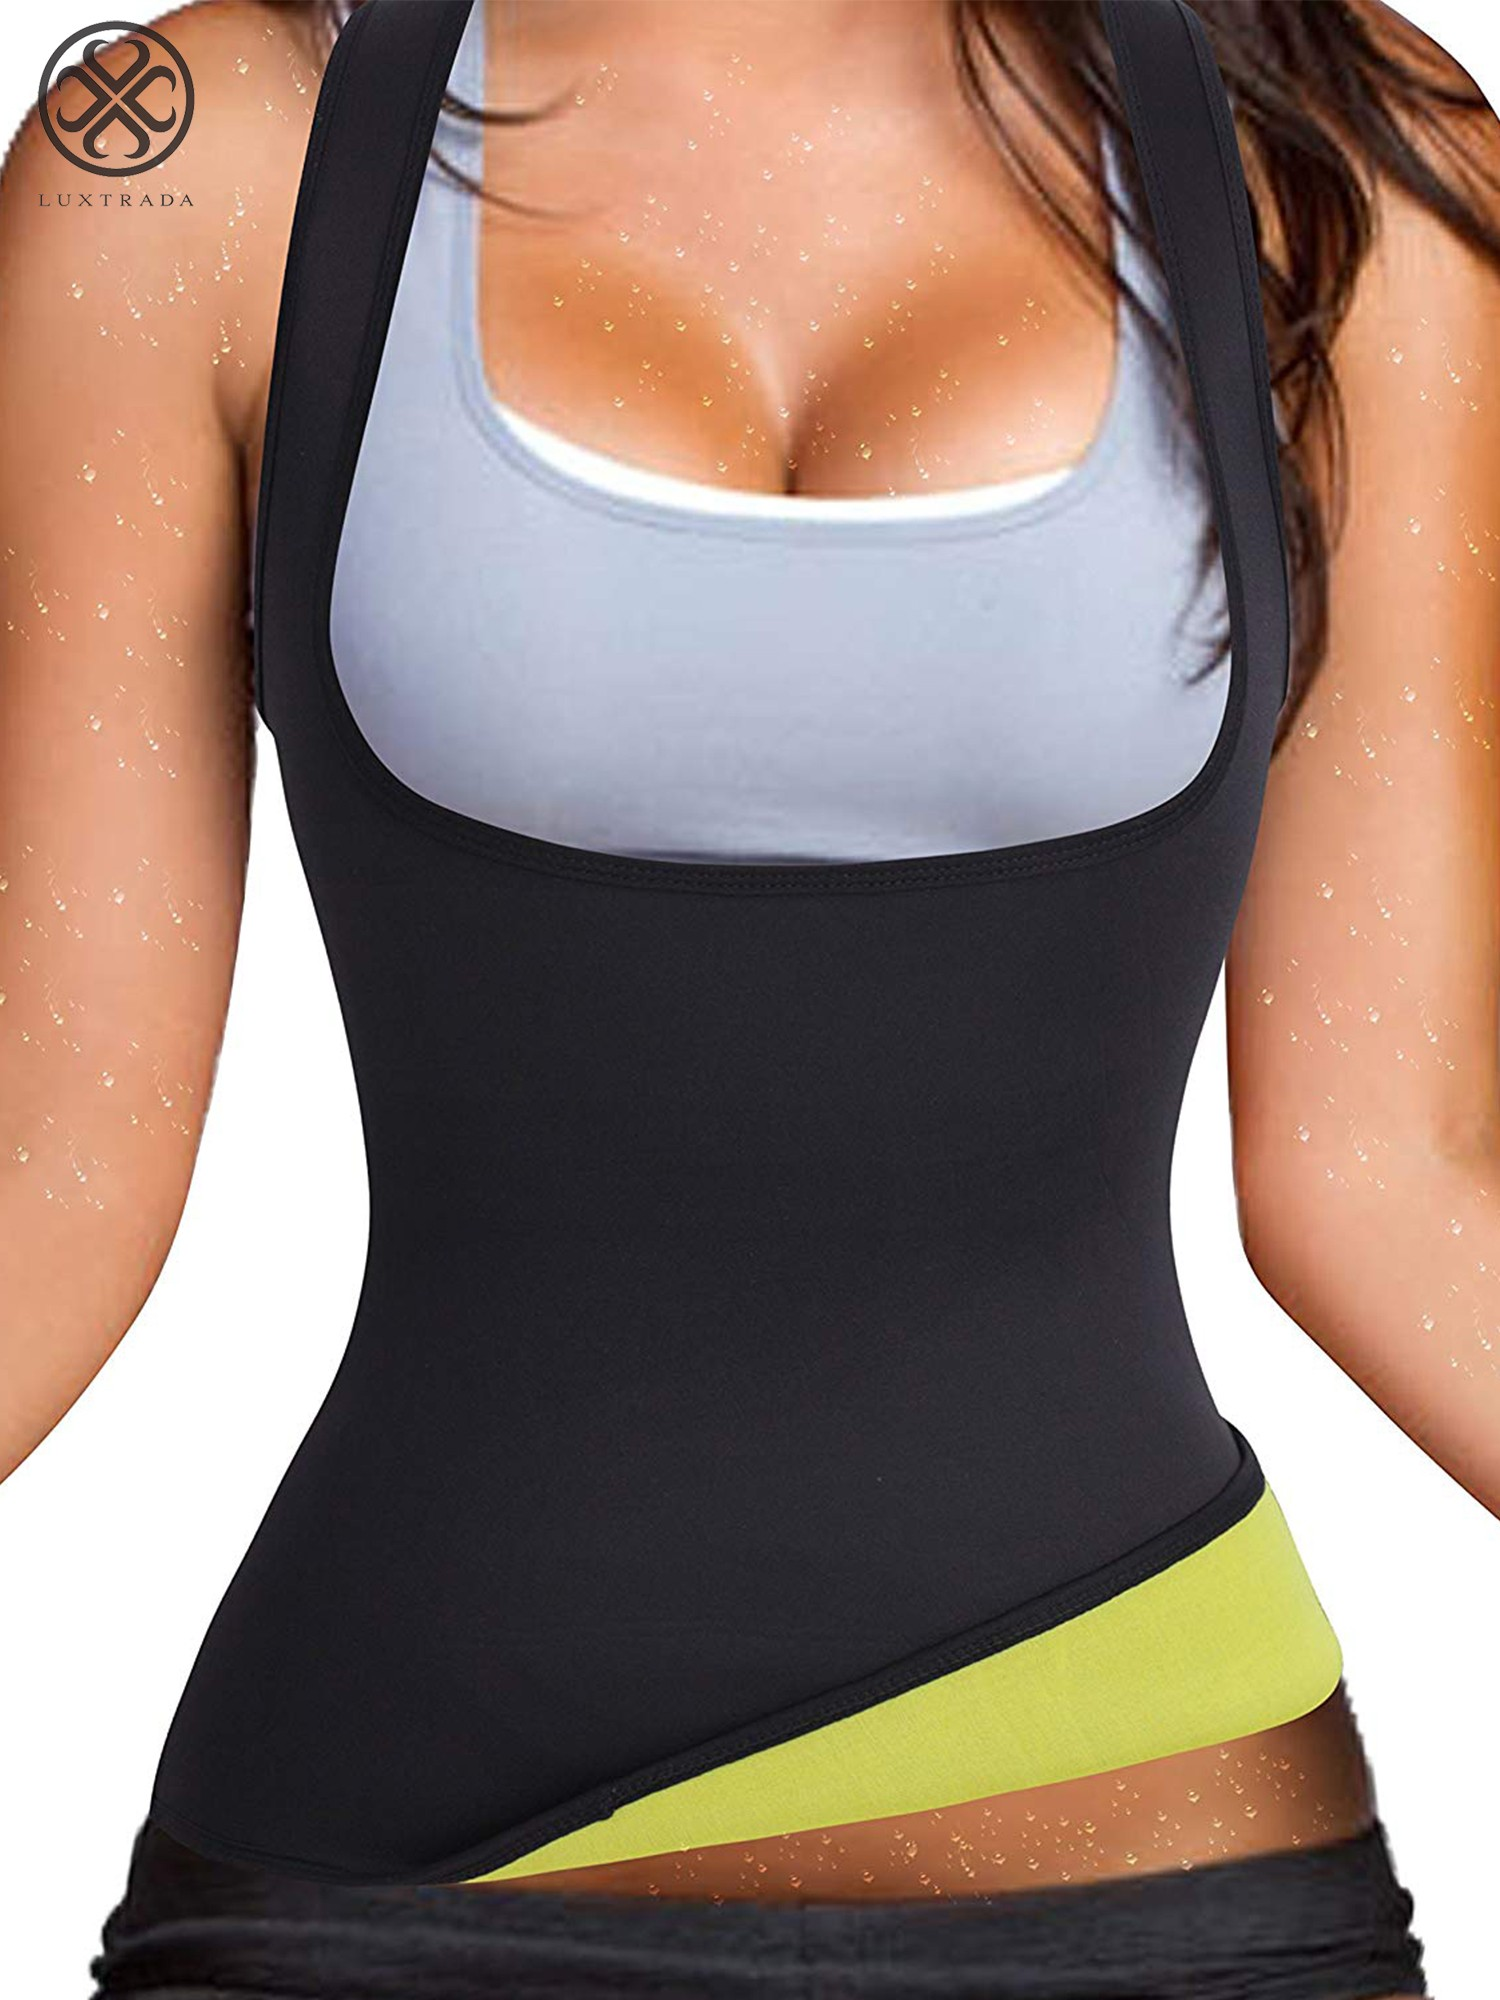 Luxtrada Tummy Control Body Shaper Top Vest Waist Trainer Sauna Suits for  Fitness Hourglass Body